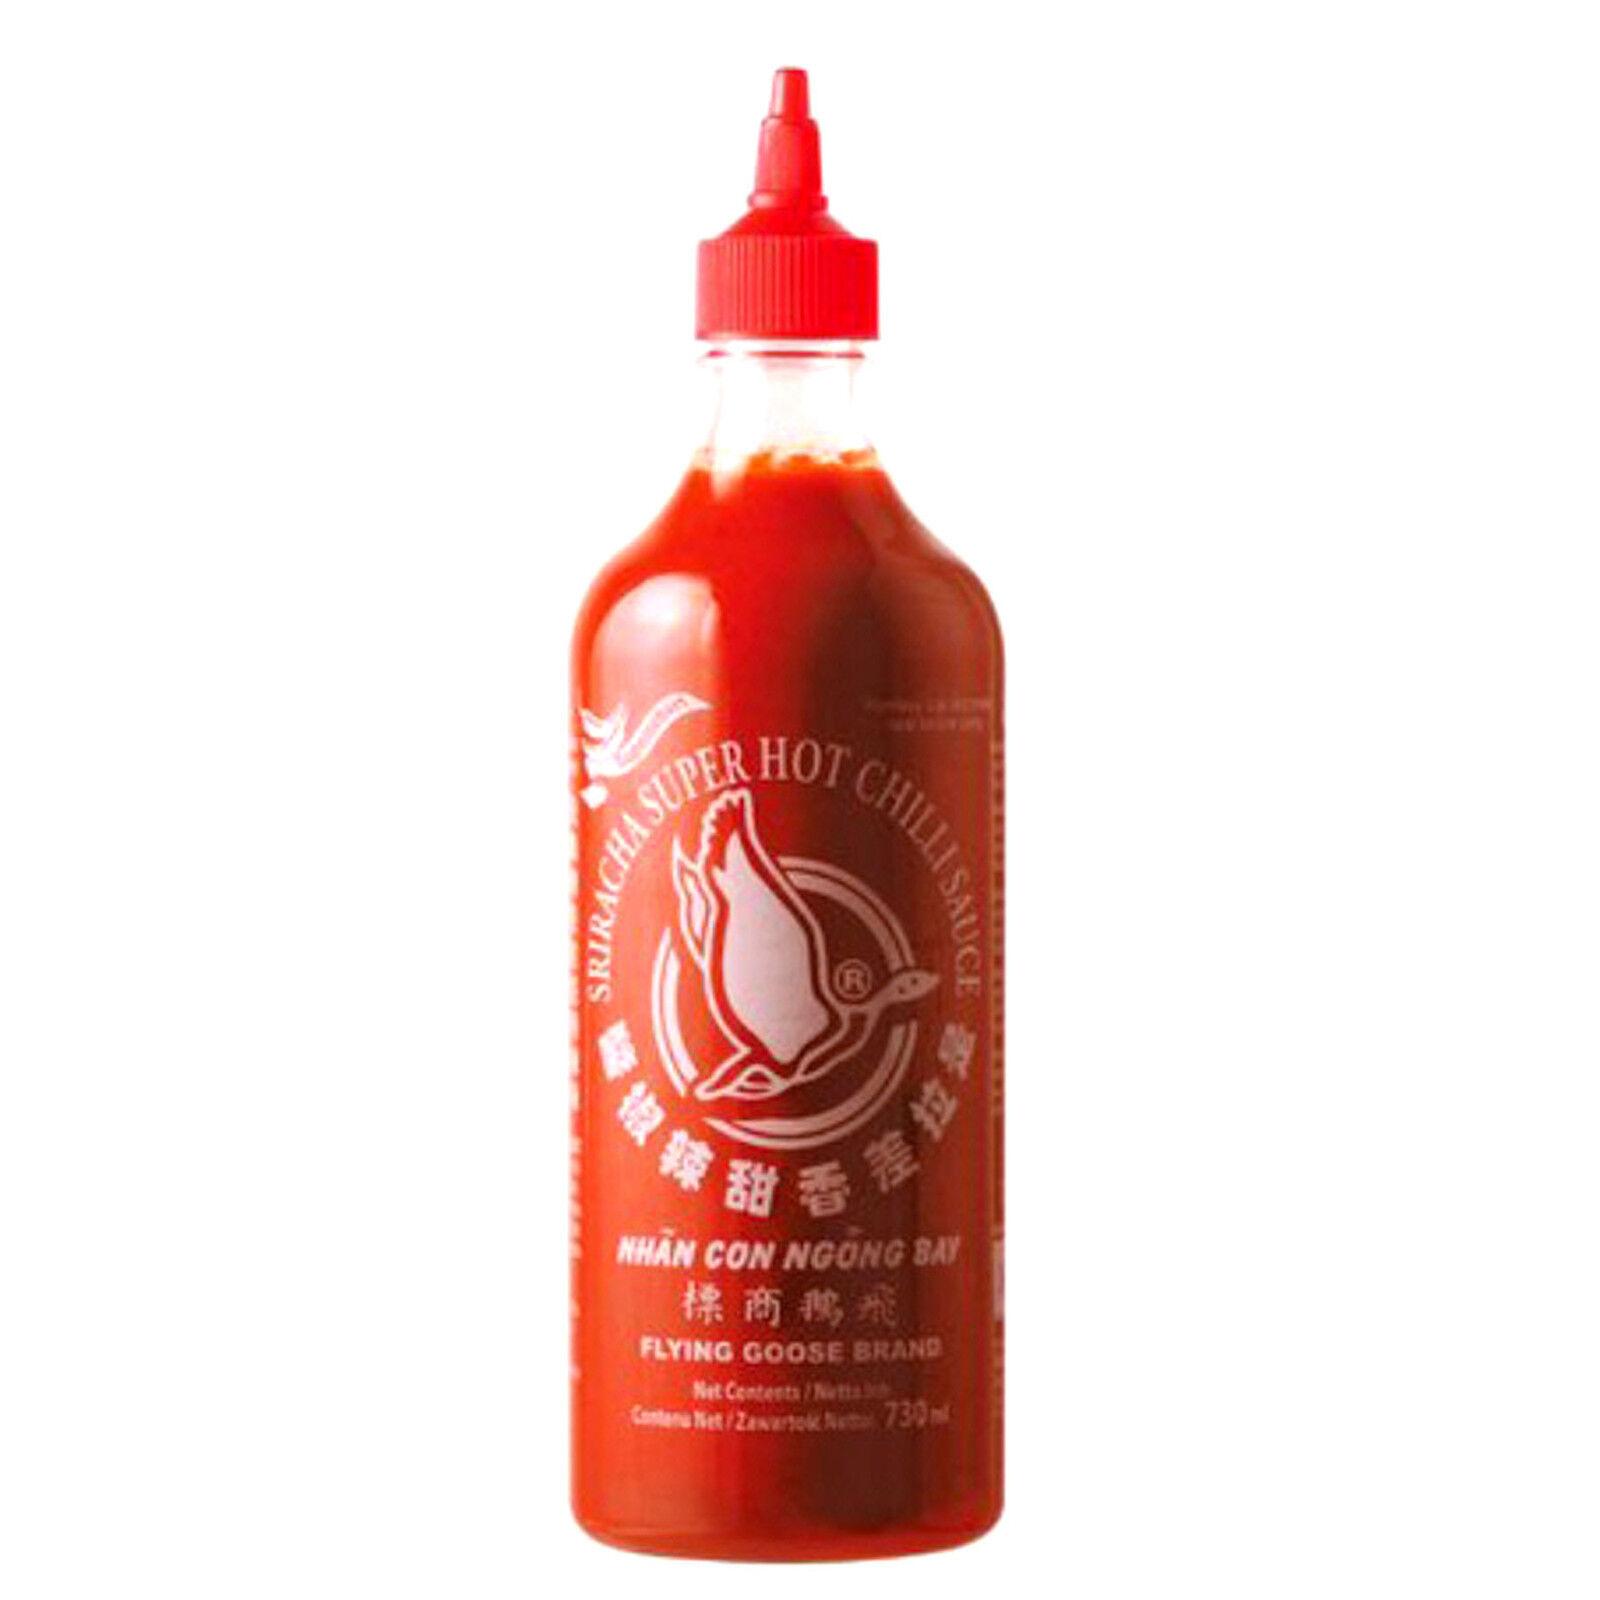 730ml sehr scharfe Sriracha Chilisauce mit Knoblauch Flying Goose Brand 70%Chili